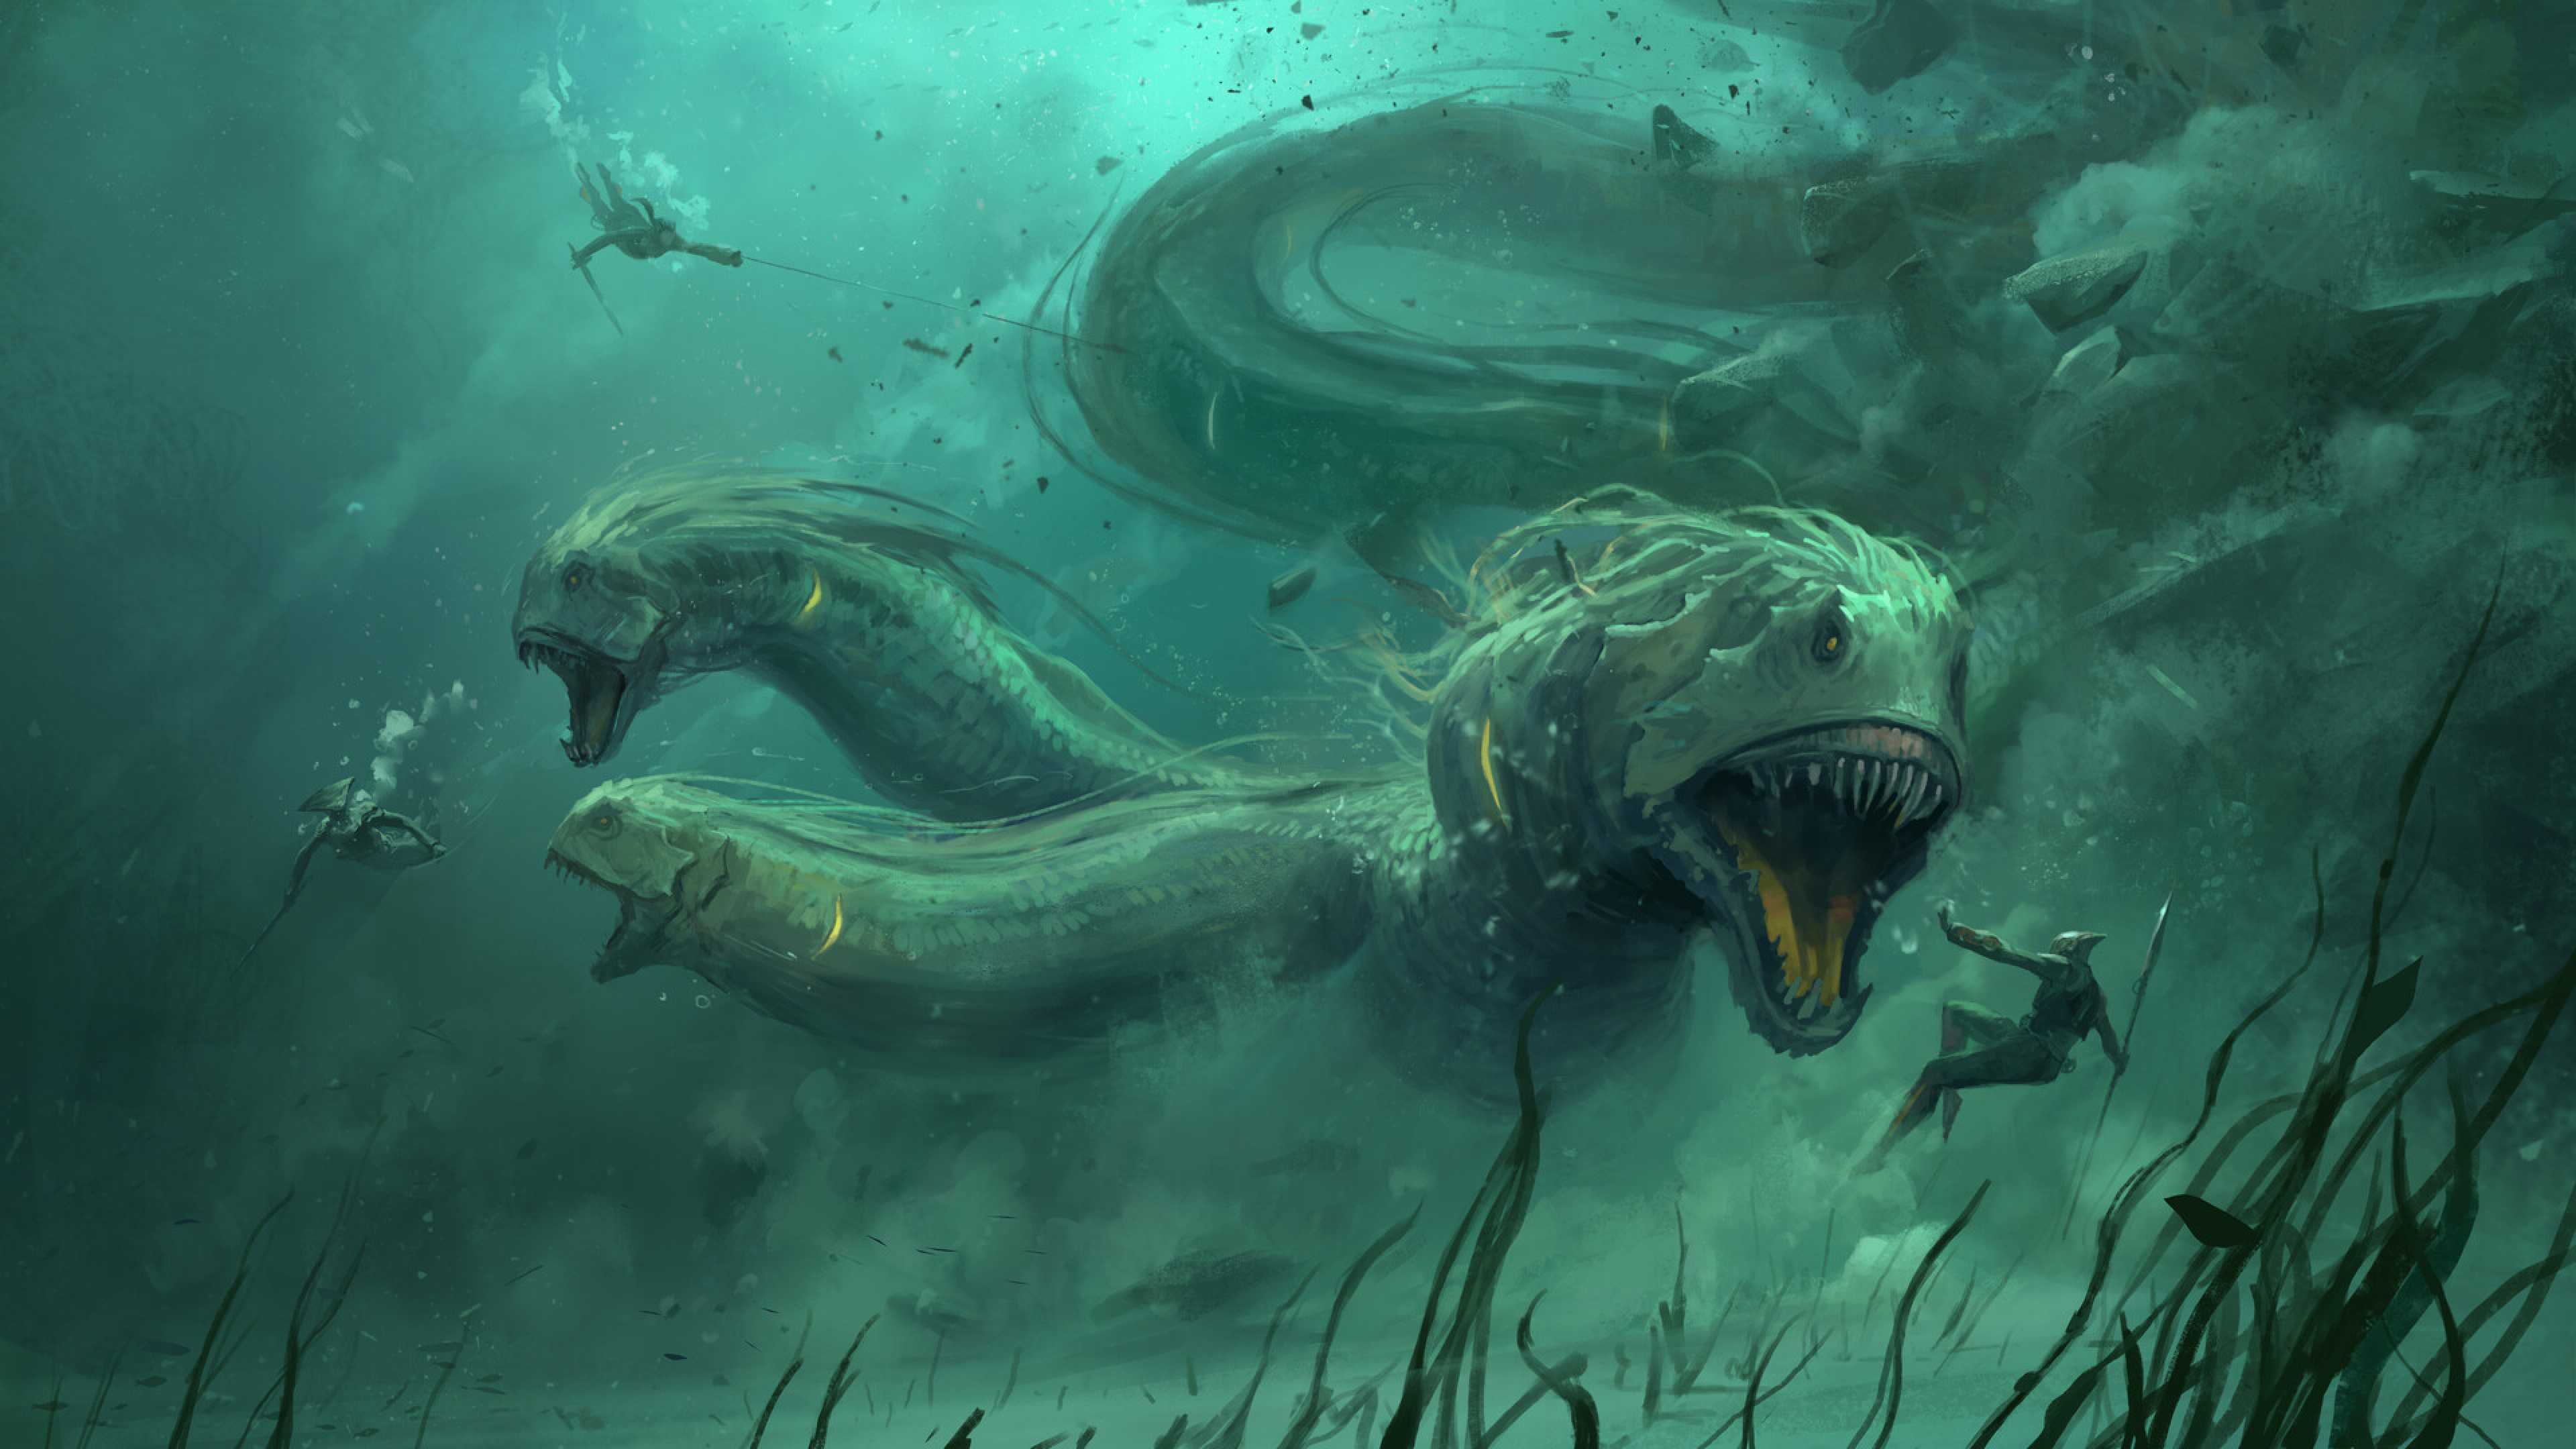 3840x2160 Underwater Creature 4k Wallpaper Hd Fantasy 4k